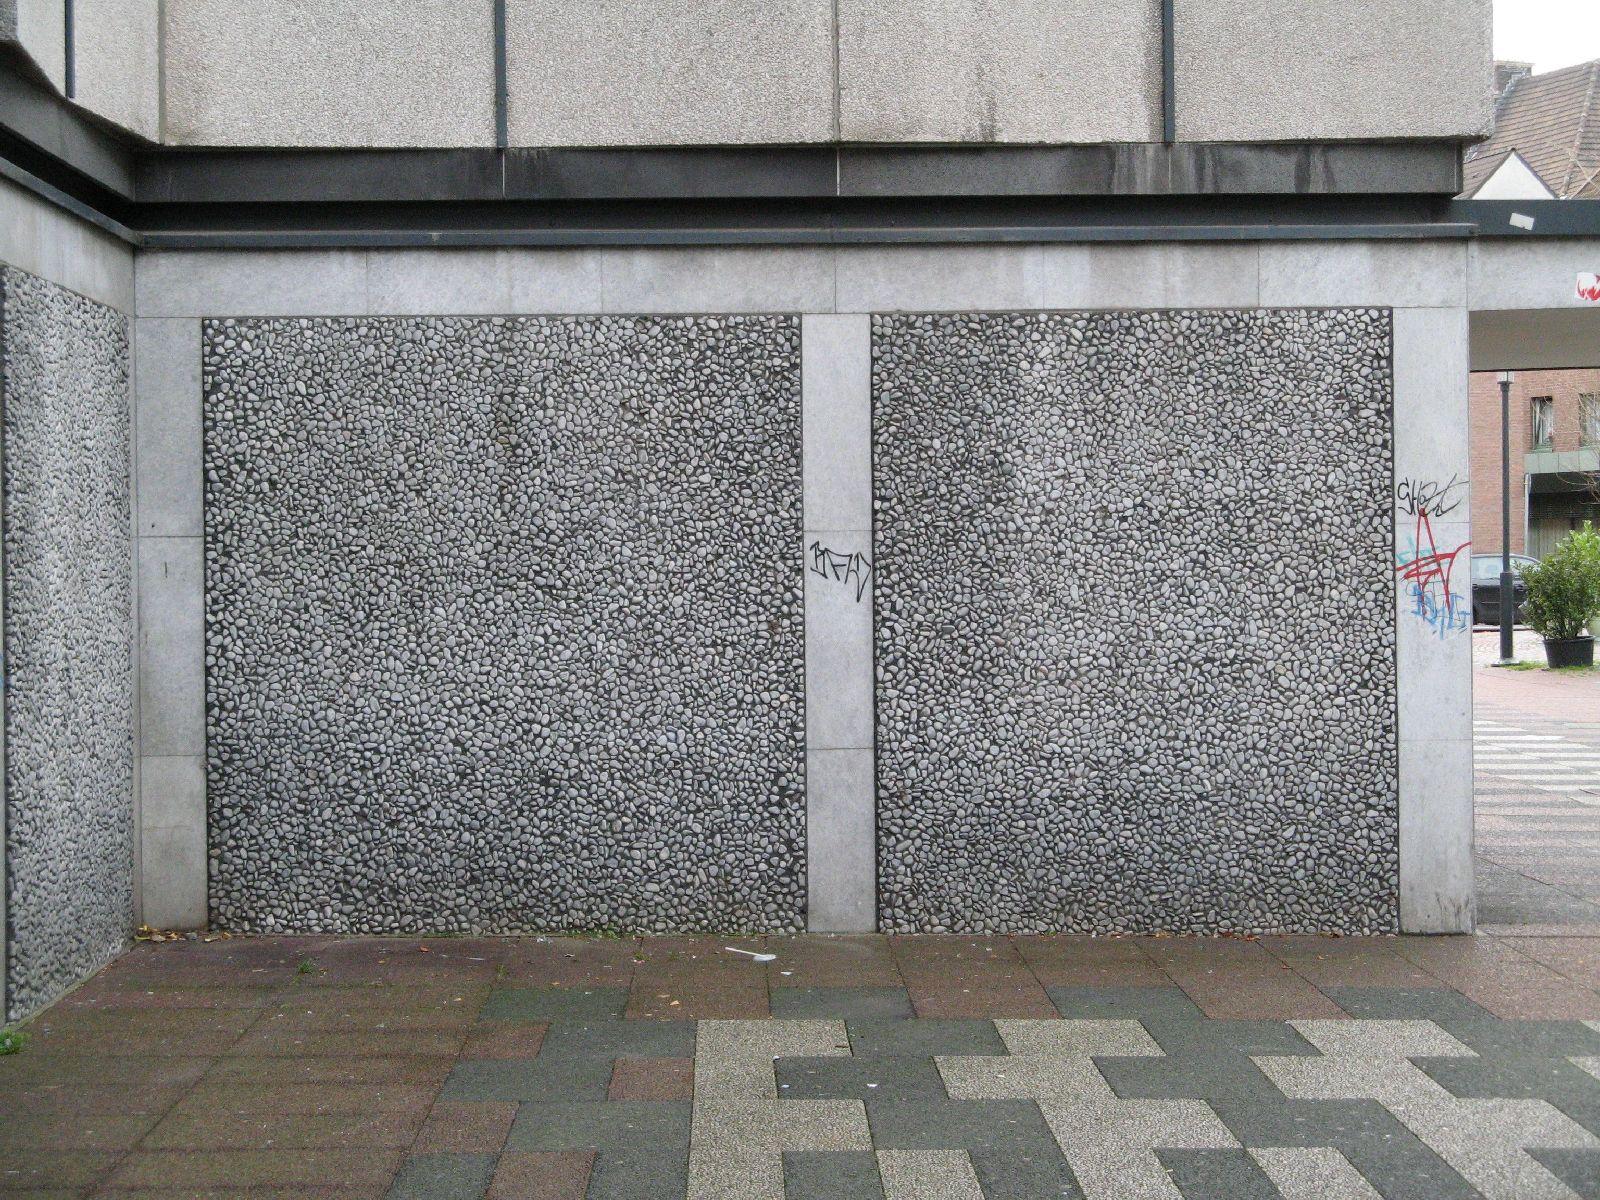 Building_Texture_B_02433